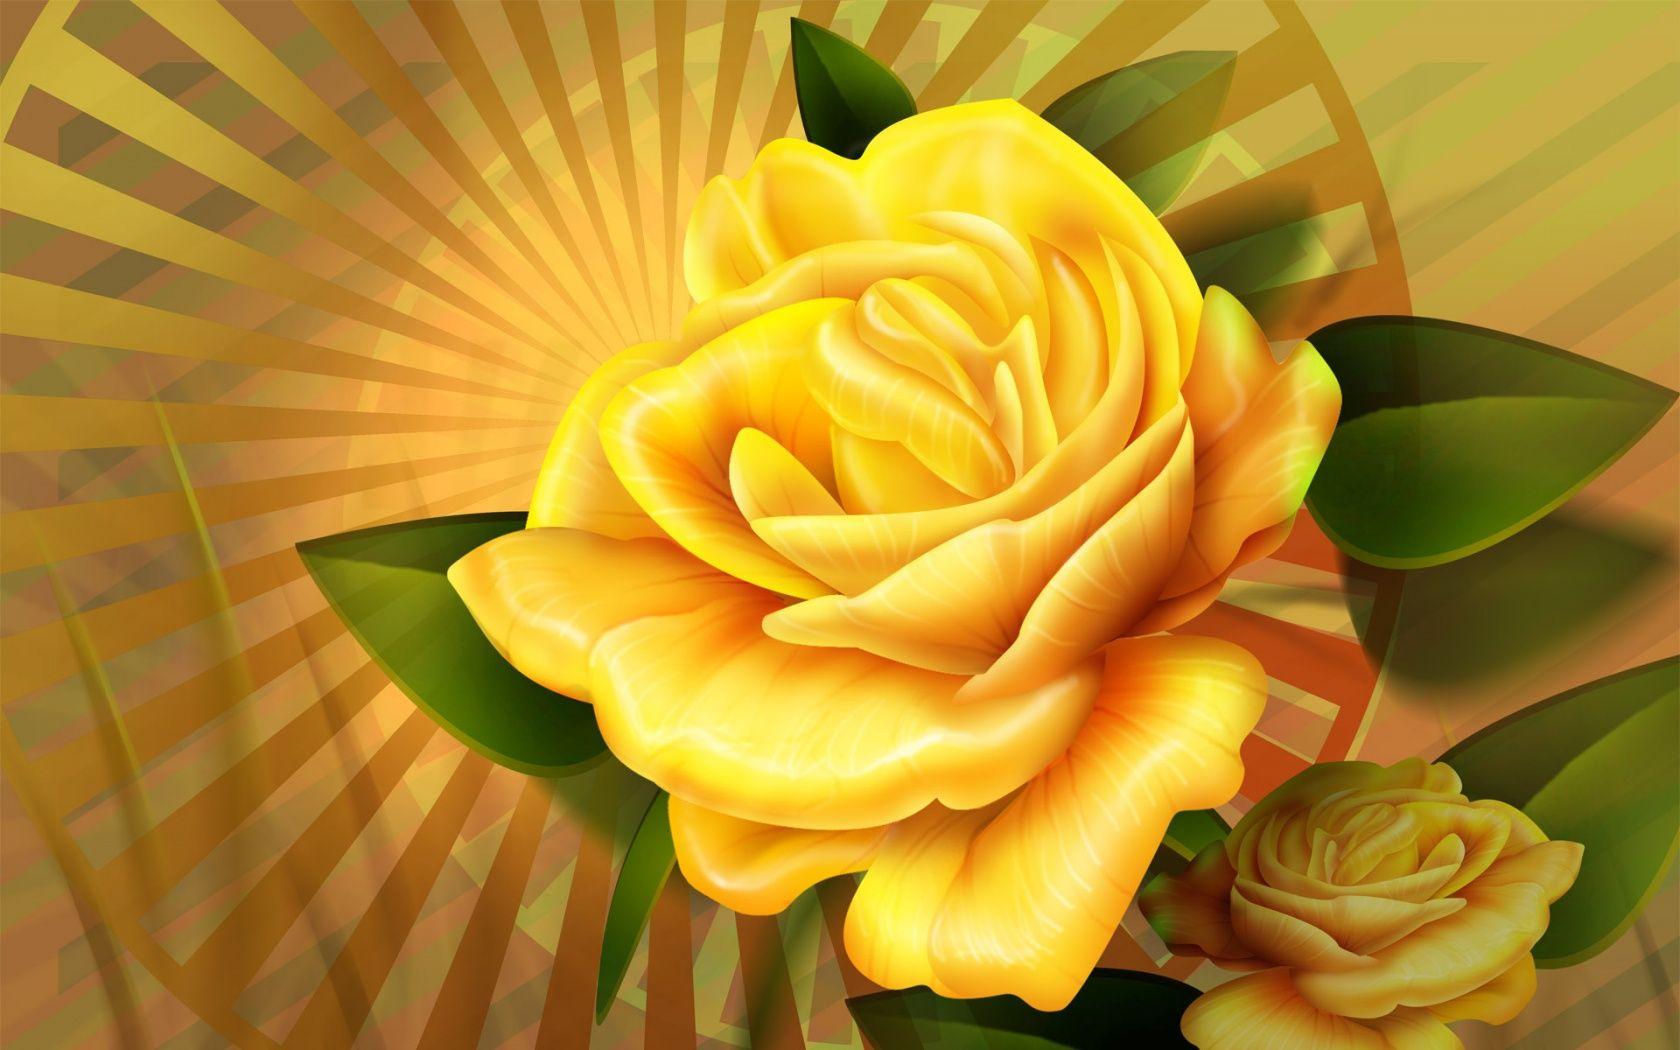 Hd wallpaper yellow flowers - Yellow Flowers Pictures Flowers Wallpapers Hd Wallpapers Widescreen Yellow Rose Wide